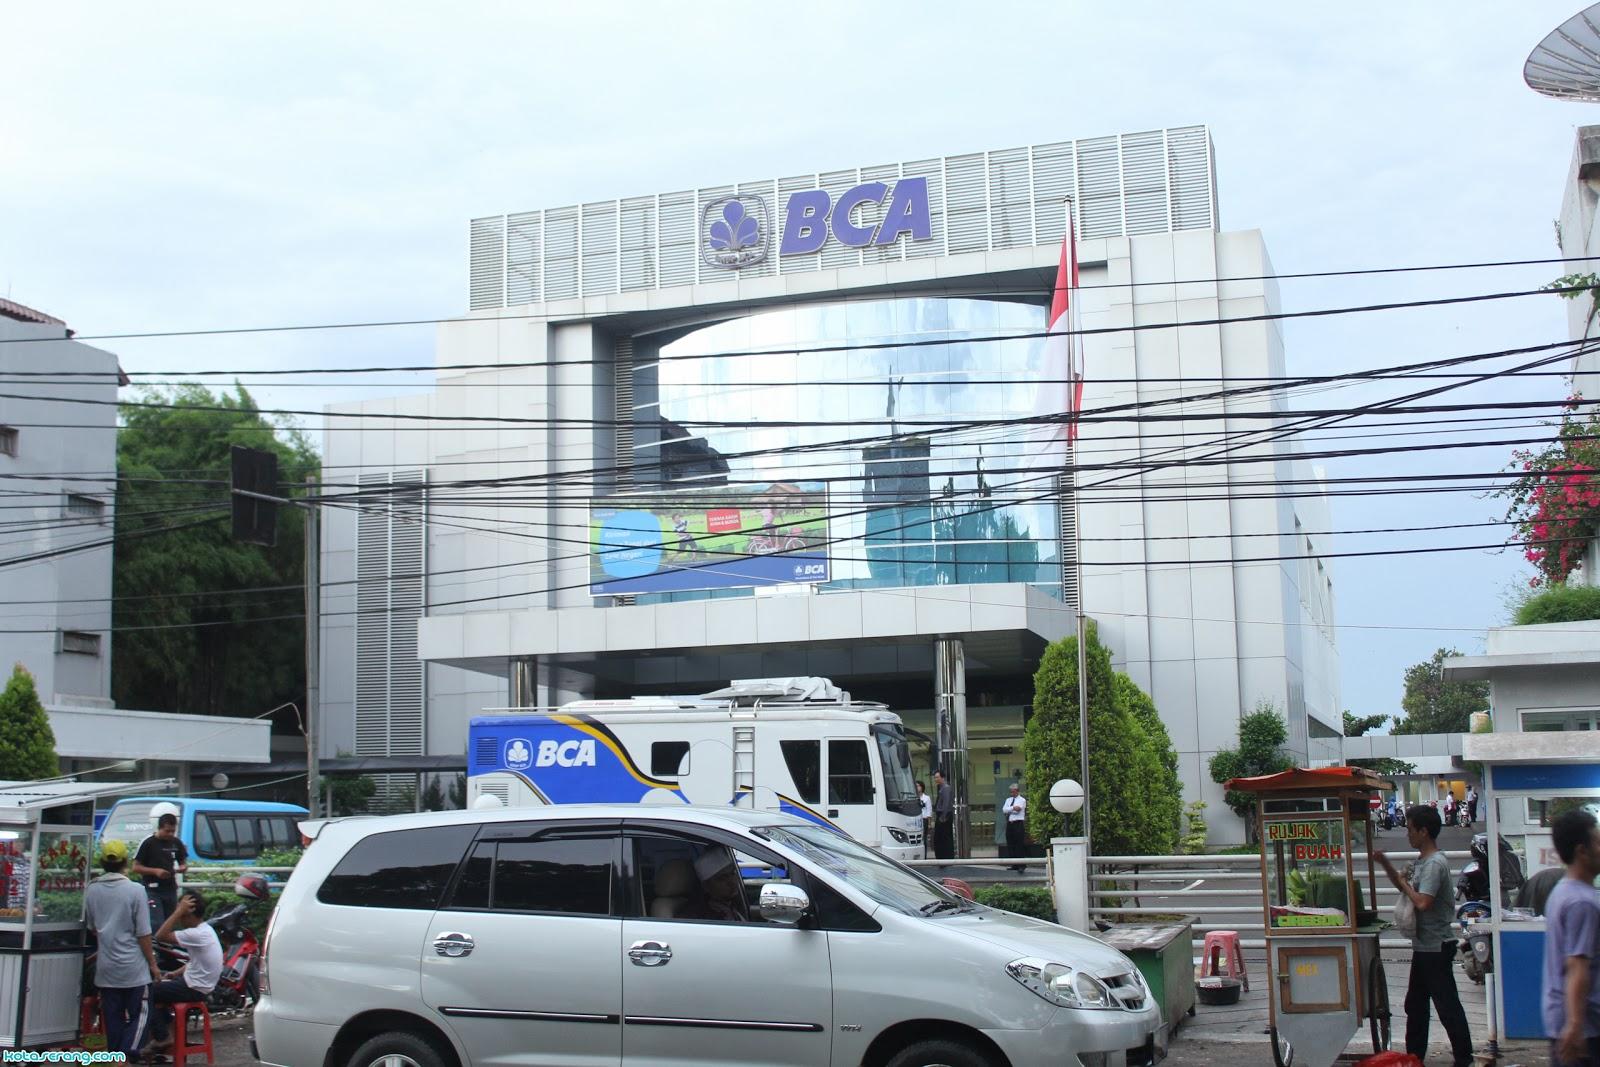 Lokasi Atm Bca Dan Kantor Cabang Daerah Serang Cilegon Pandeglang Dan Tangerang Kotaserang Com